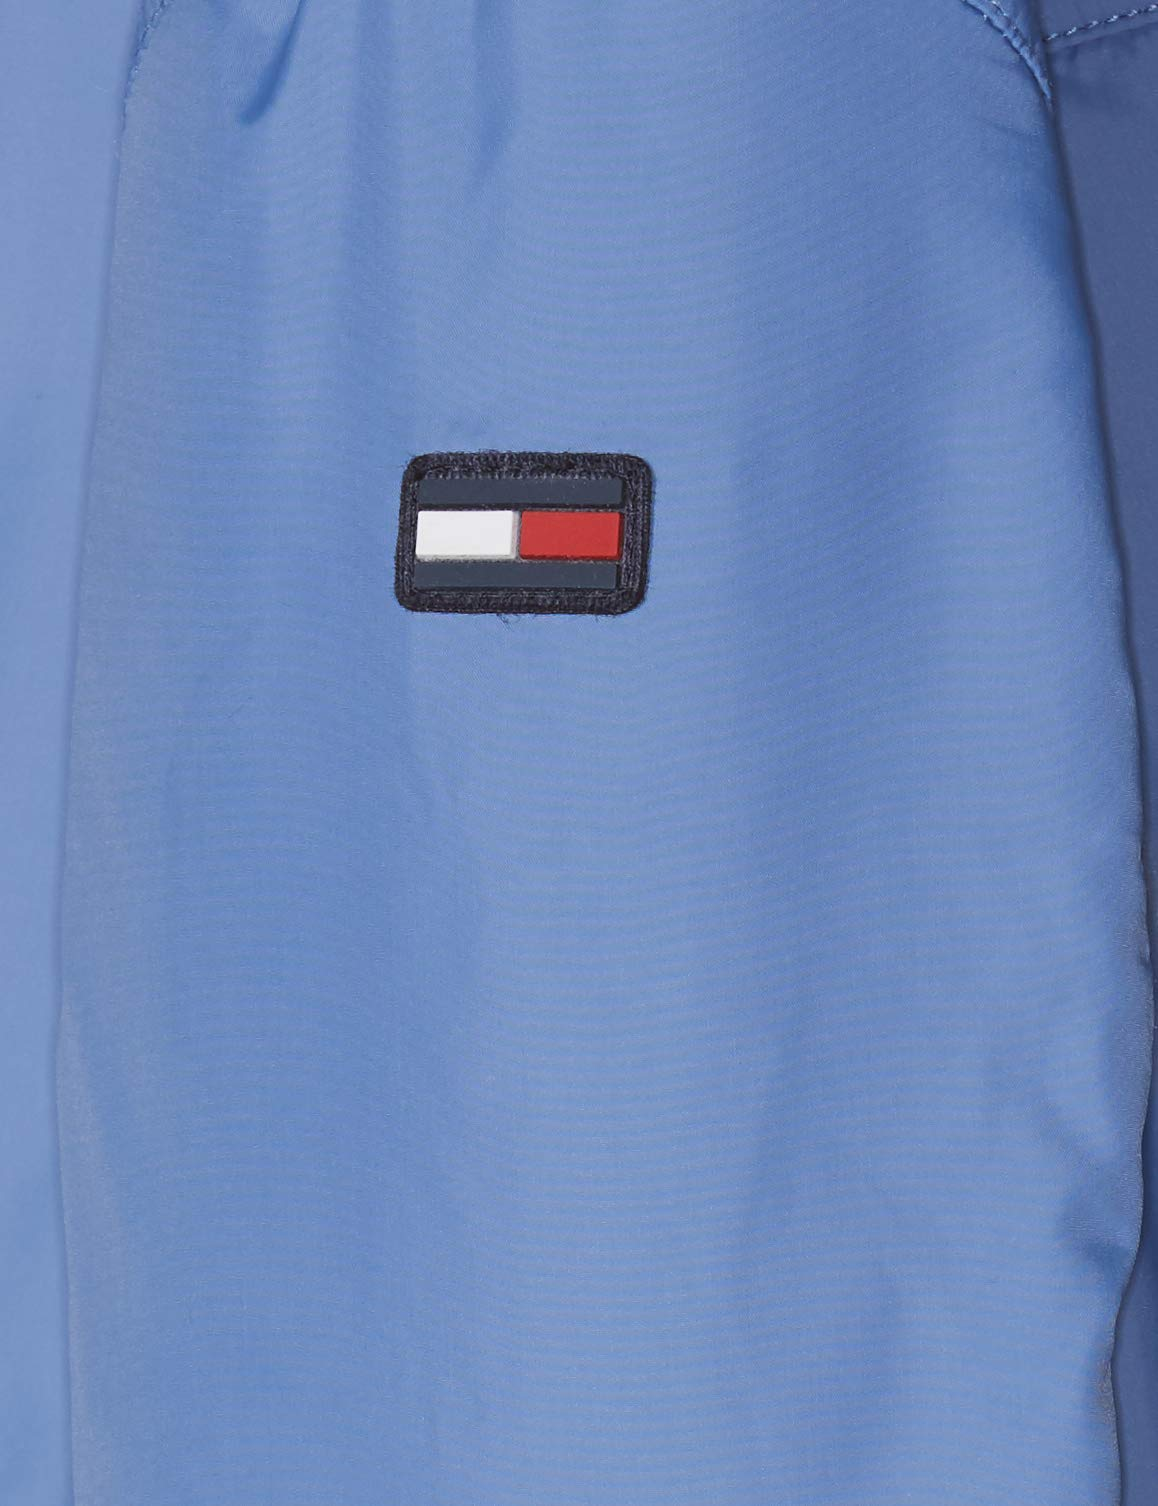 Tommy Hilfiger Reversible Teddy Jacket Chaqueta para Bebés 3